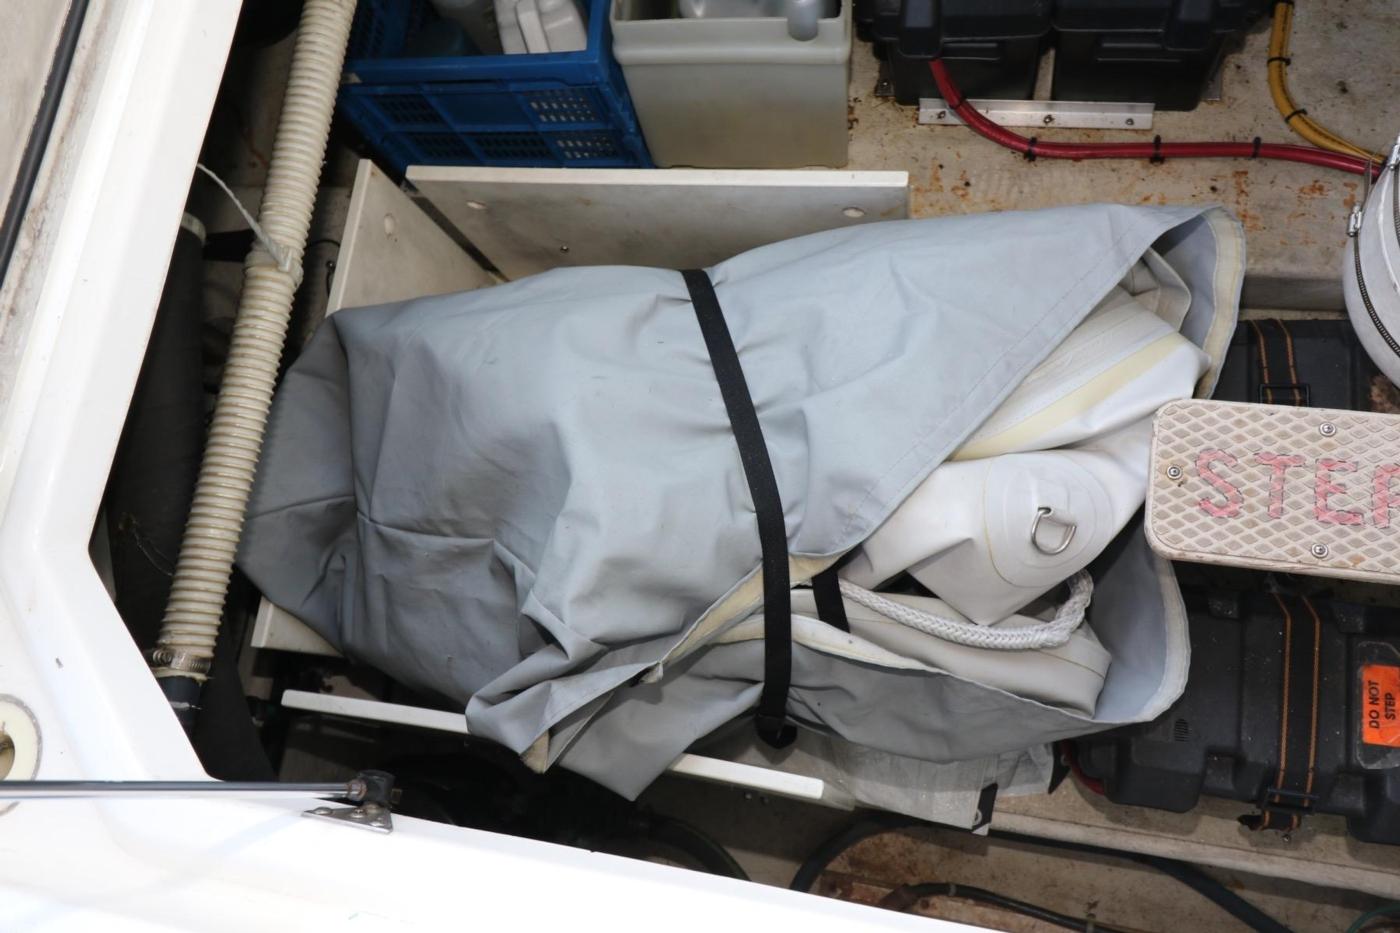 1999 Bayliner 5788 Pilot House Motoryacht, Yachtub Stowed